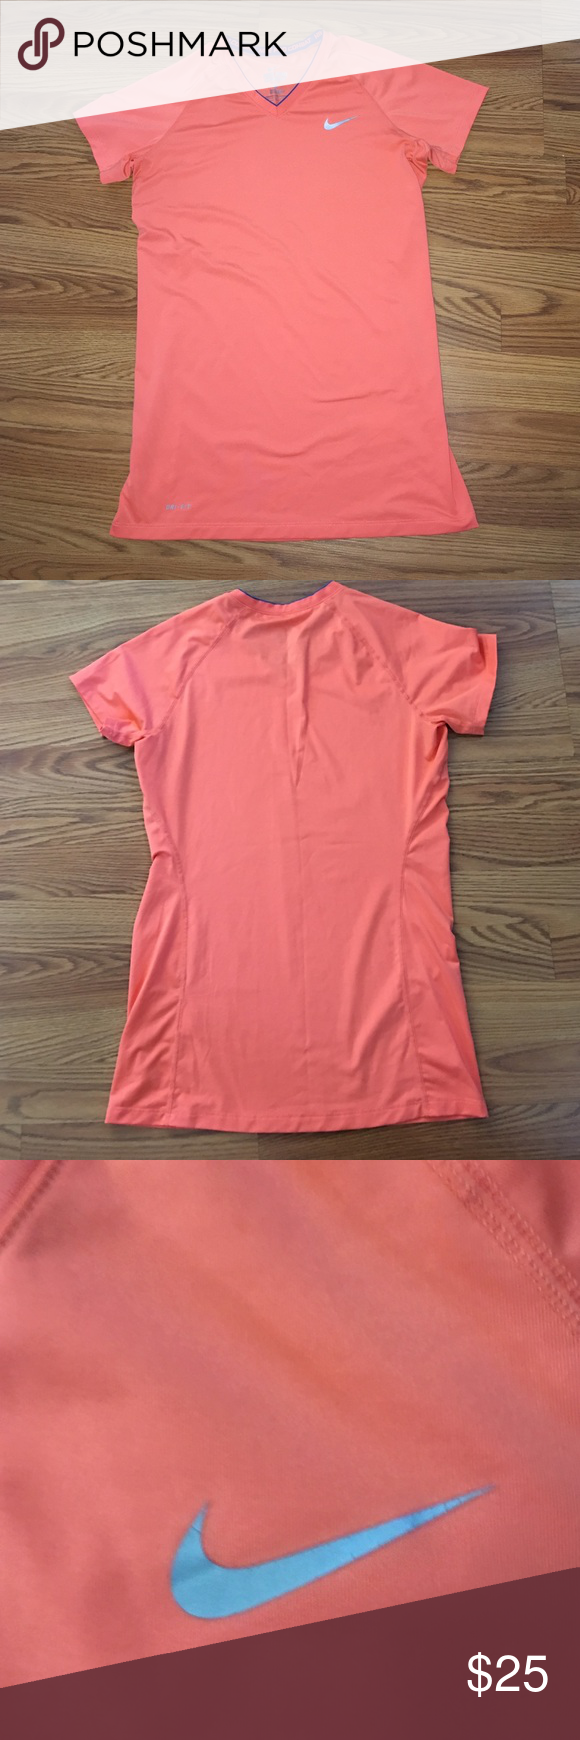 🆕Nike Pro Combat Fitted V- Neck Shirt NWOT Women's Nike Pro Combat Fitted V- Neck Shirt~ Melon Nike Tops Tees - Short Sleeve